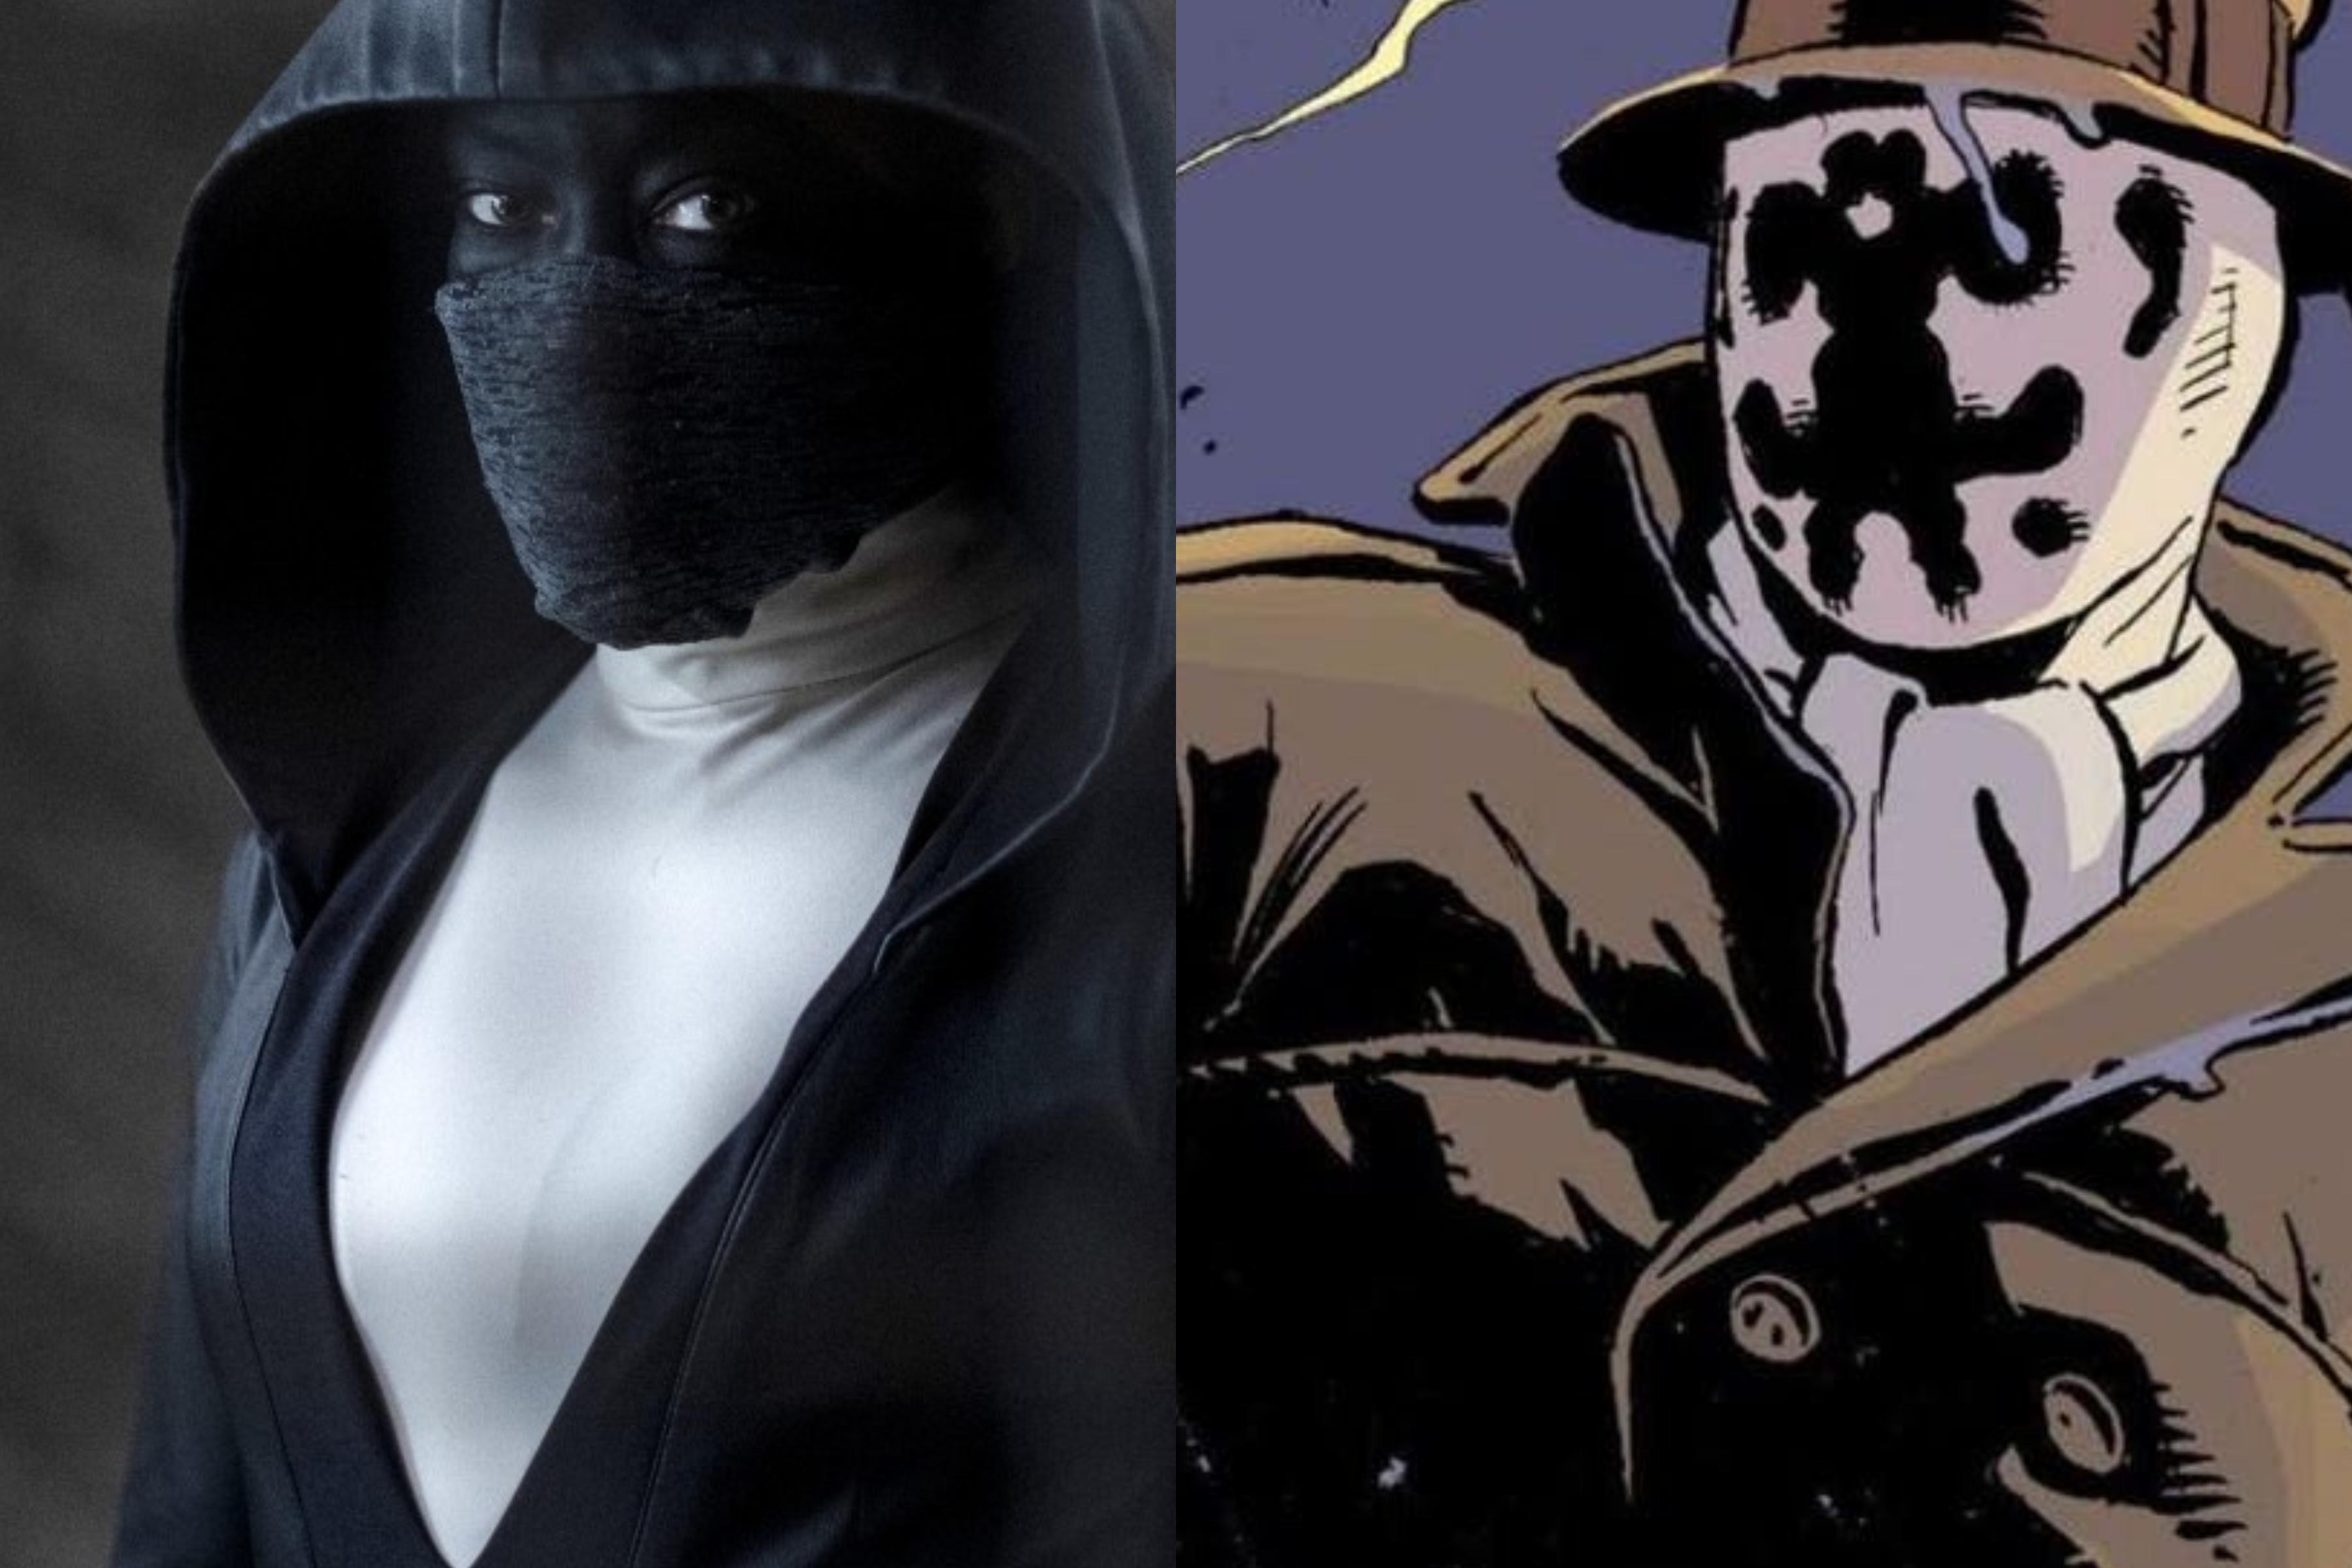 Left: HBO. Right: Gibbons/DC Comics.